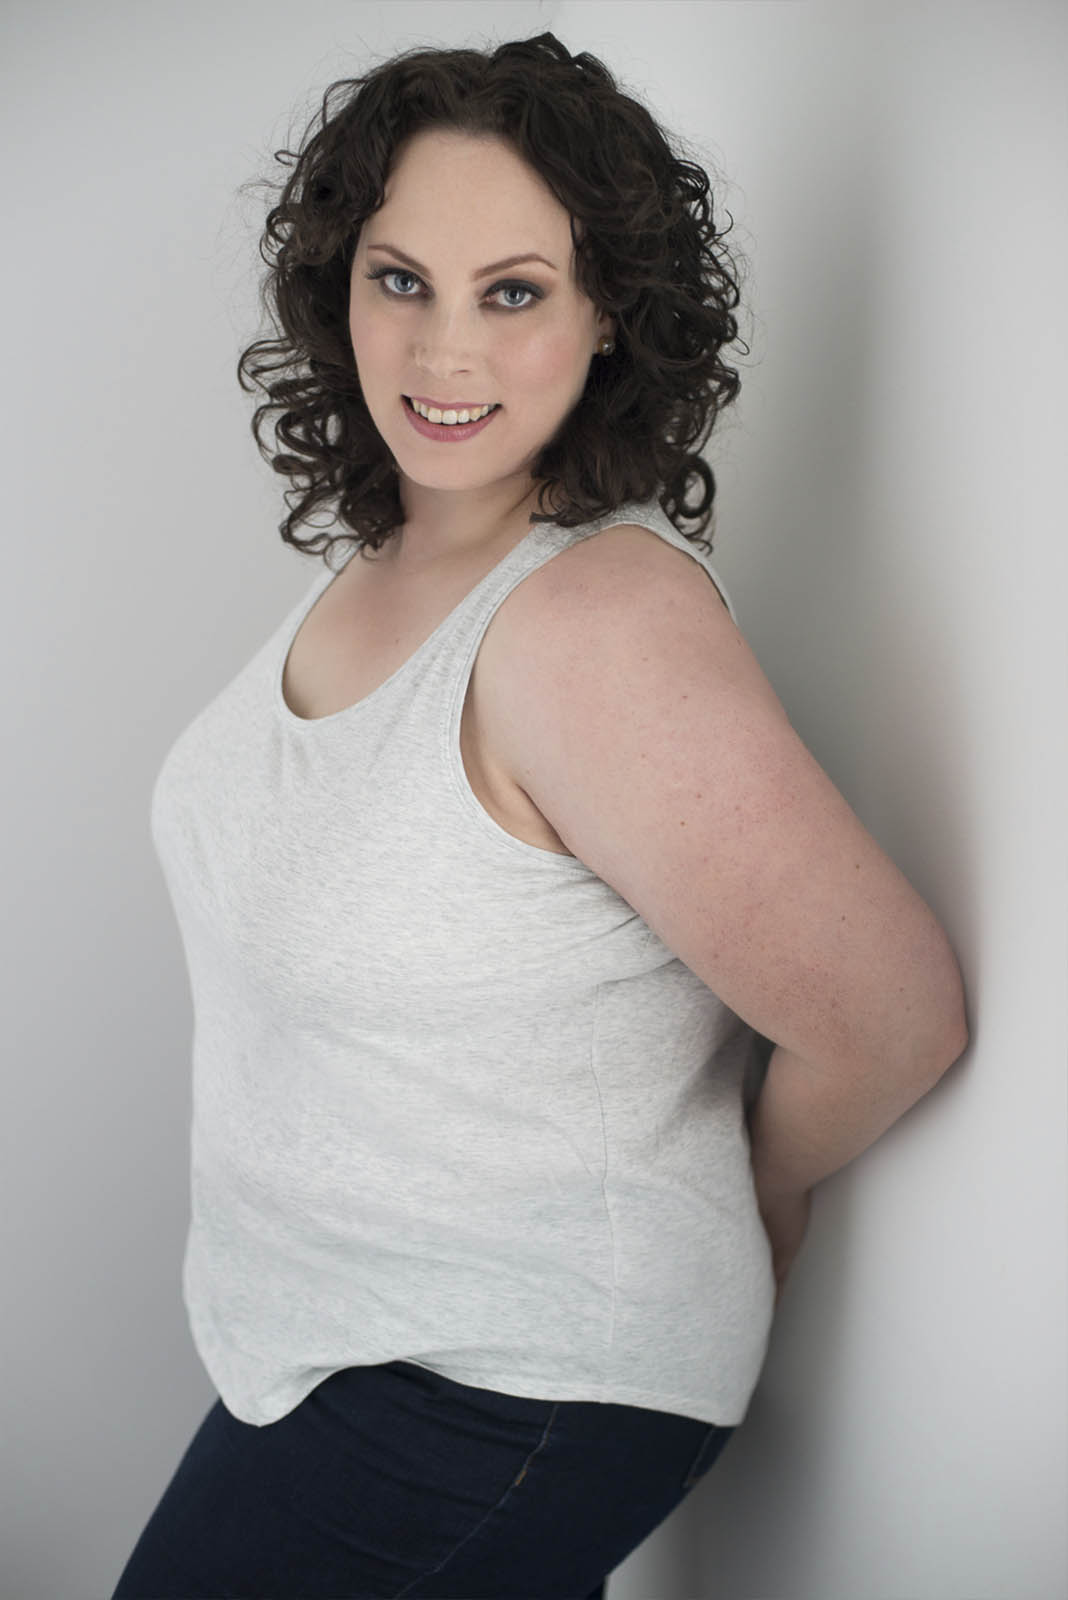 Chelsey Luren Portraits - Eating Disorder Recovery Photoshoot   Nicole Testimonial7.jpg